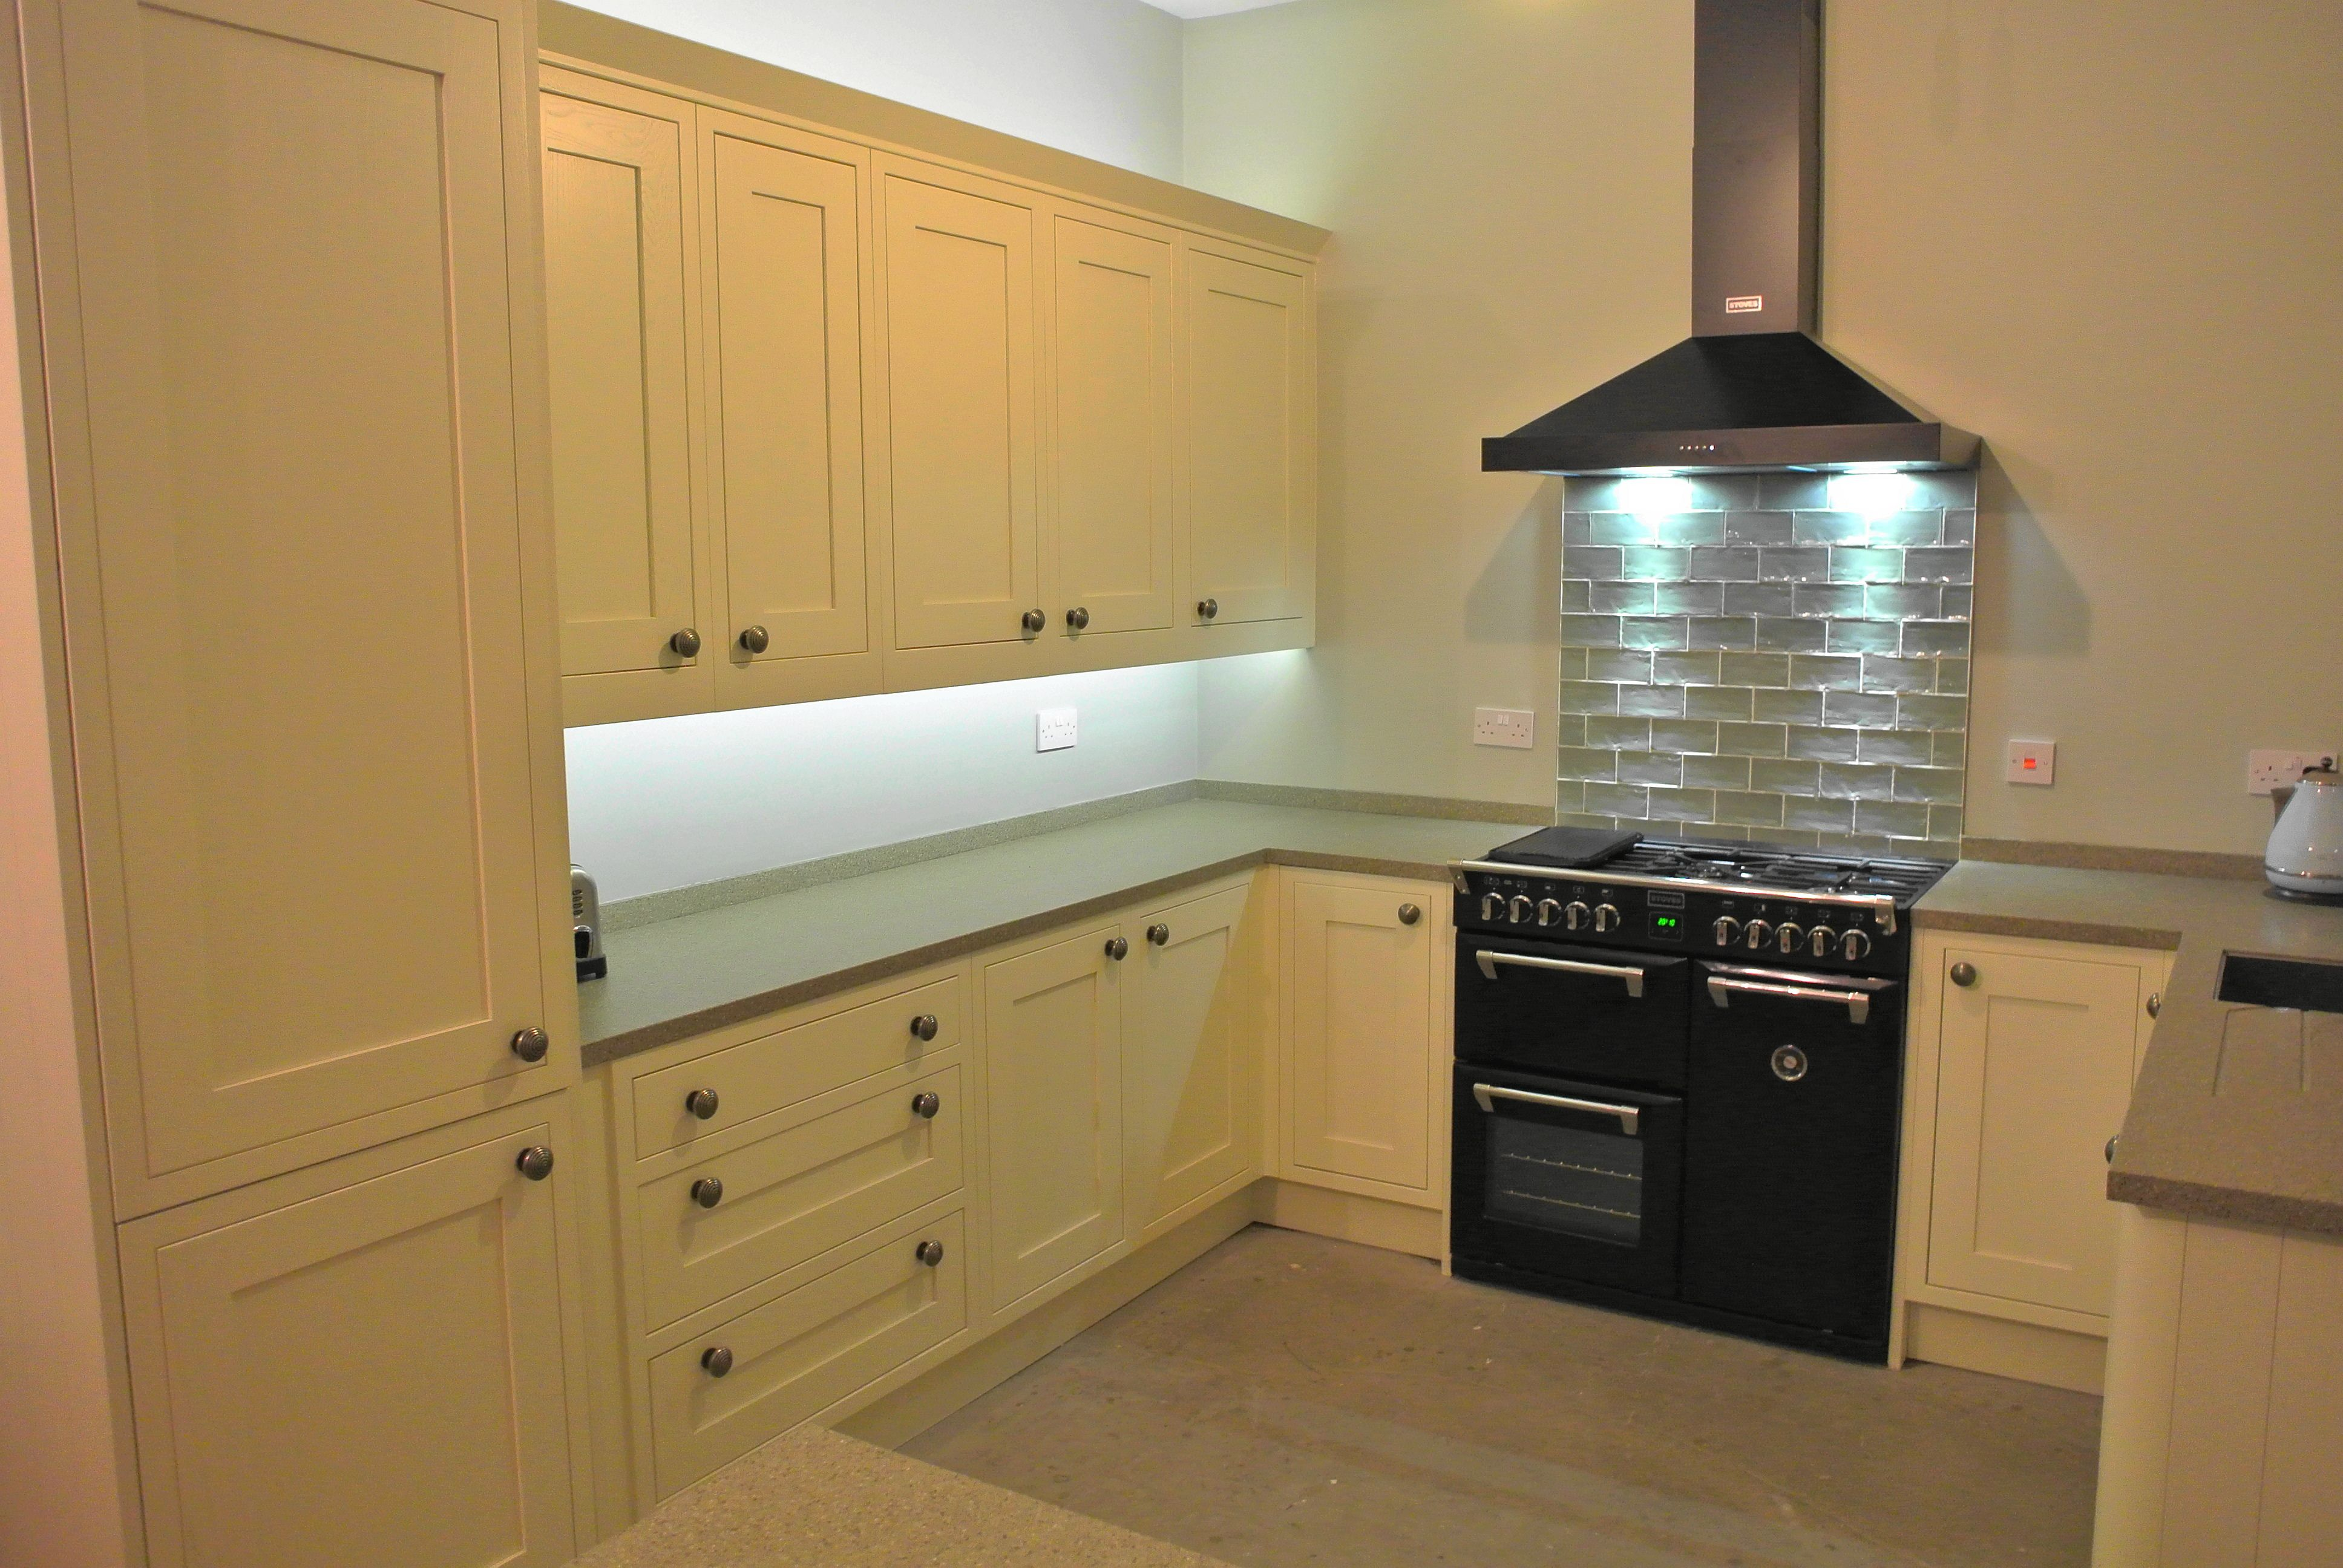 Cream Painted Kitchen, Earthstone Worksurface, Artisan Tiles, 900 Black  Range